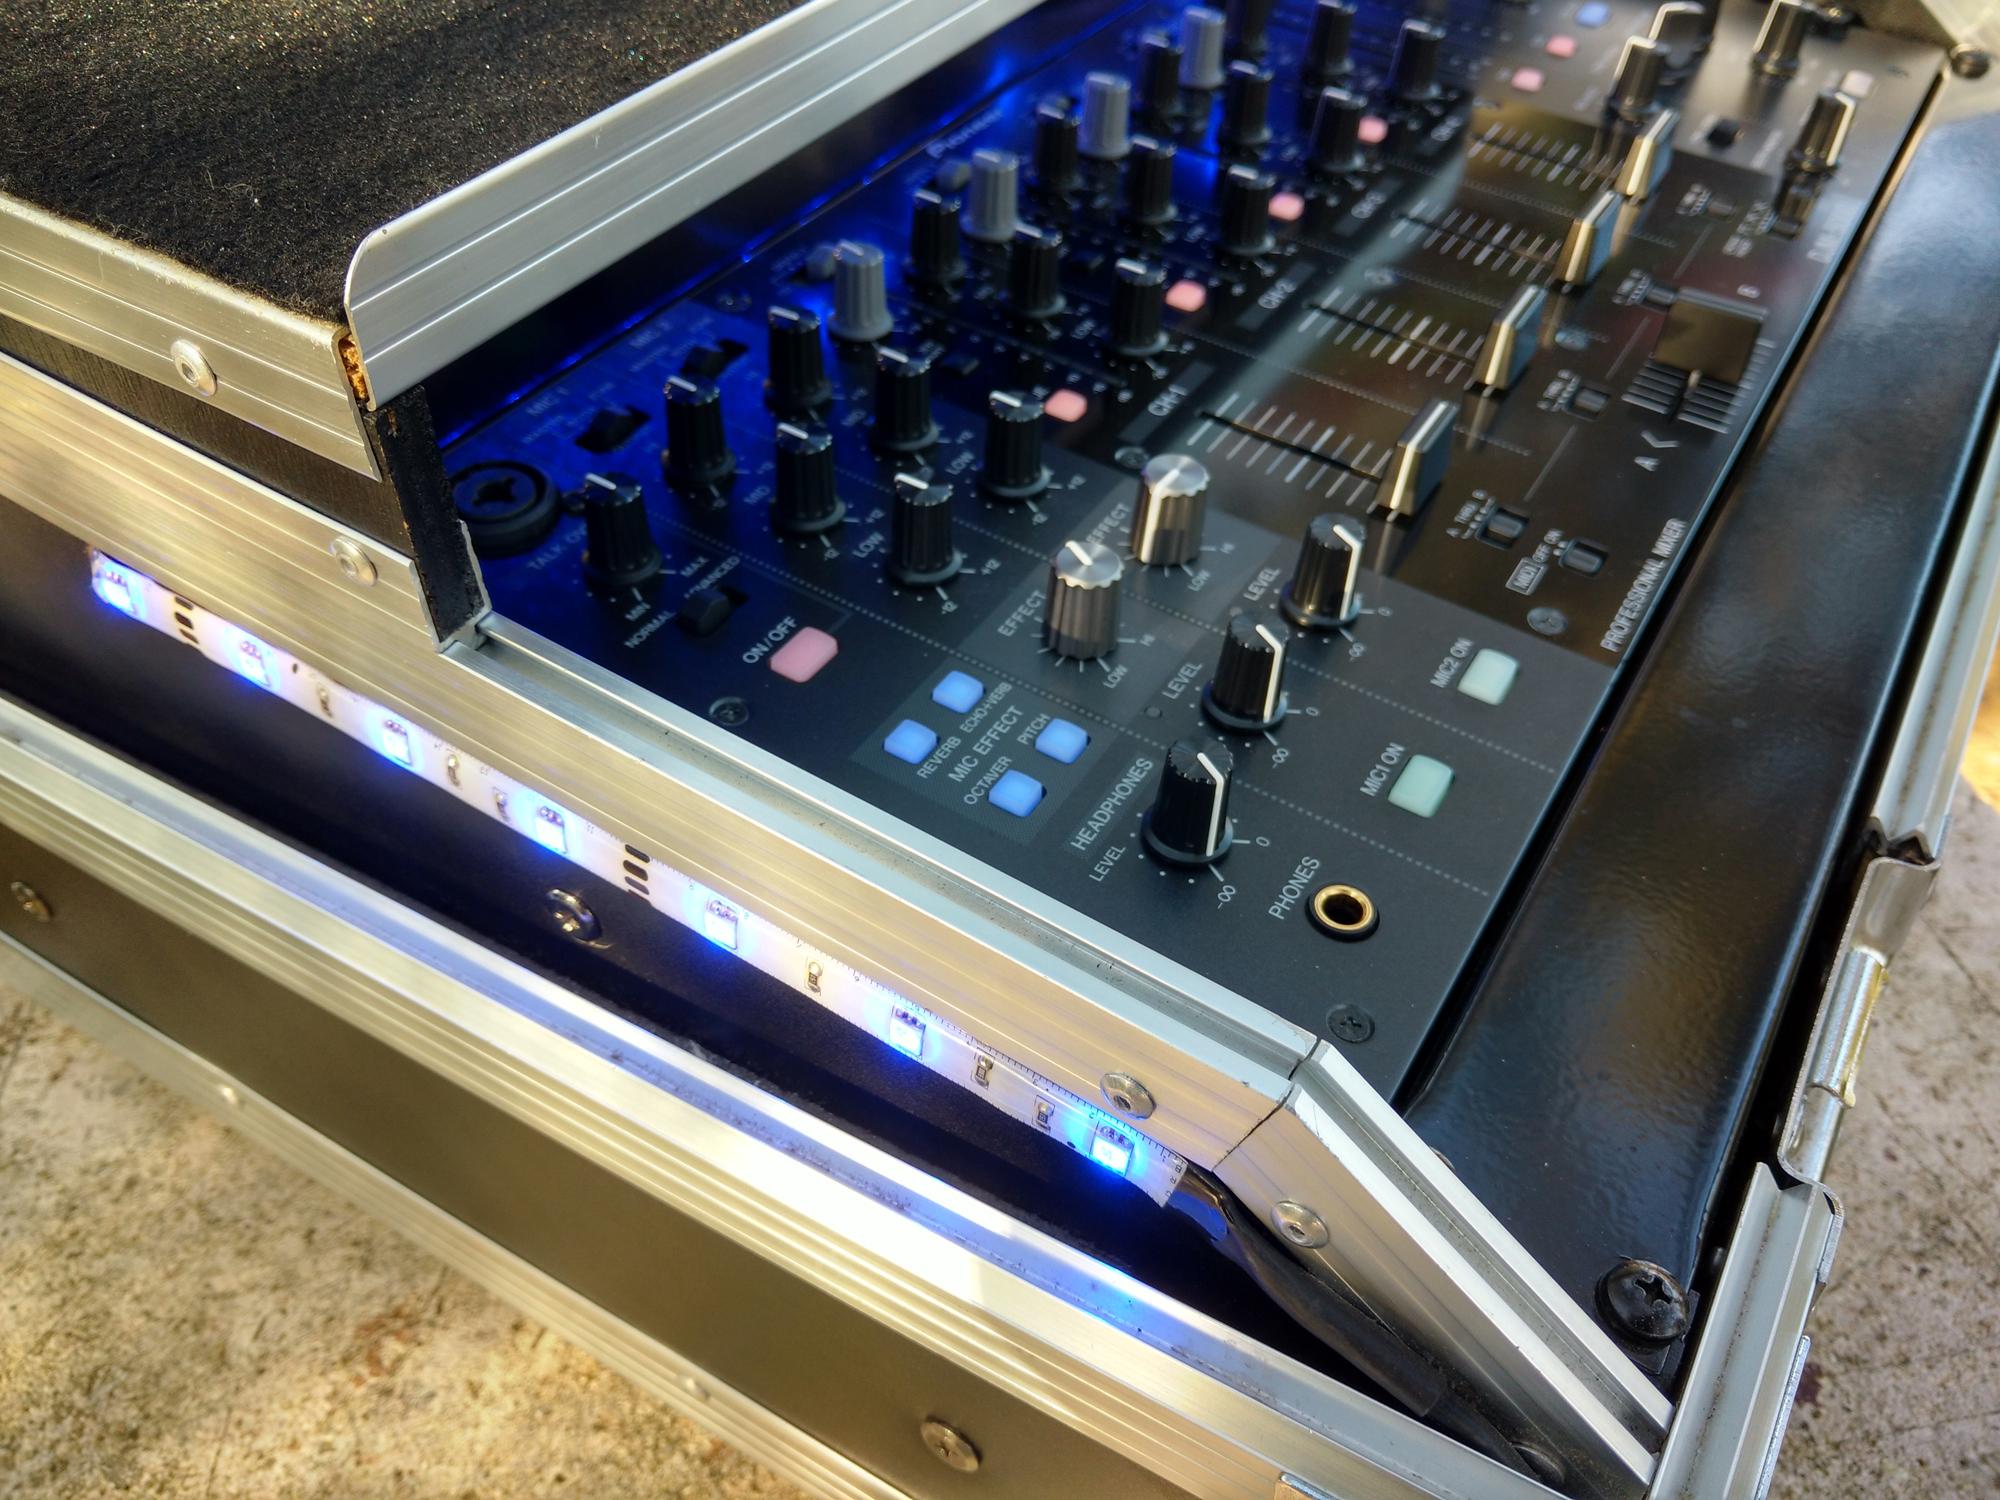 Photo pioneer djm 5000 pioneer djm 5000 table de mixage - Table de mixage pioneer djm 2000 ...